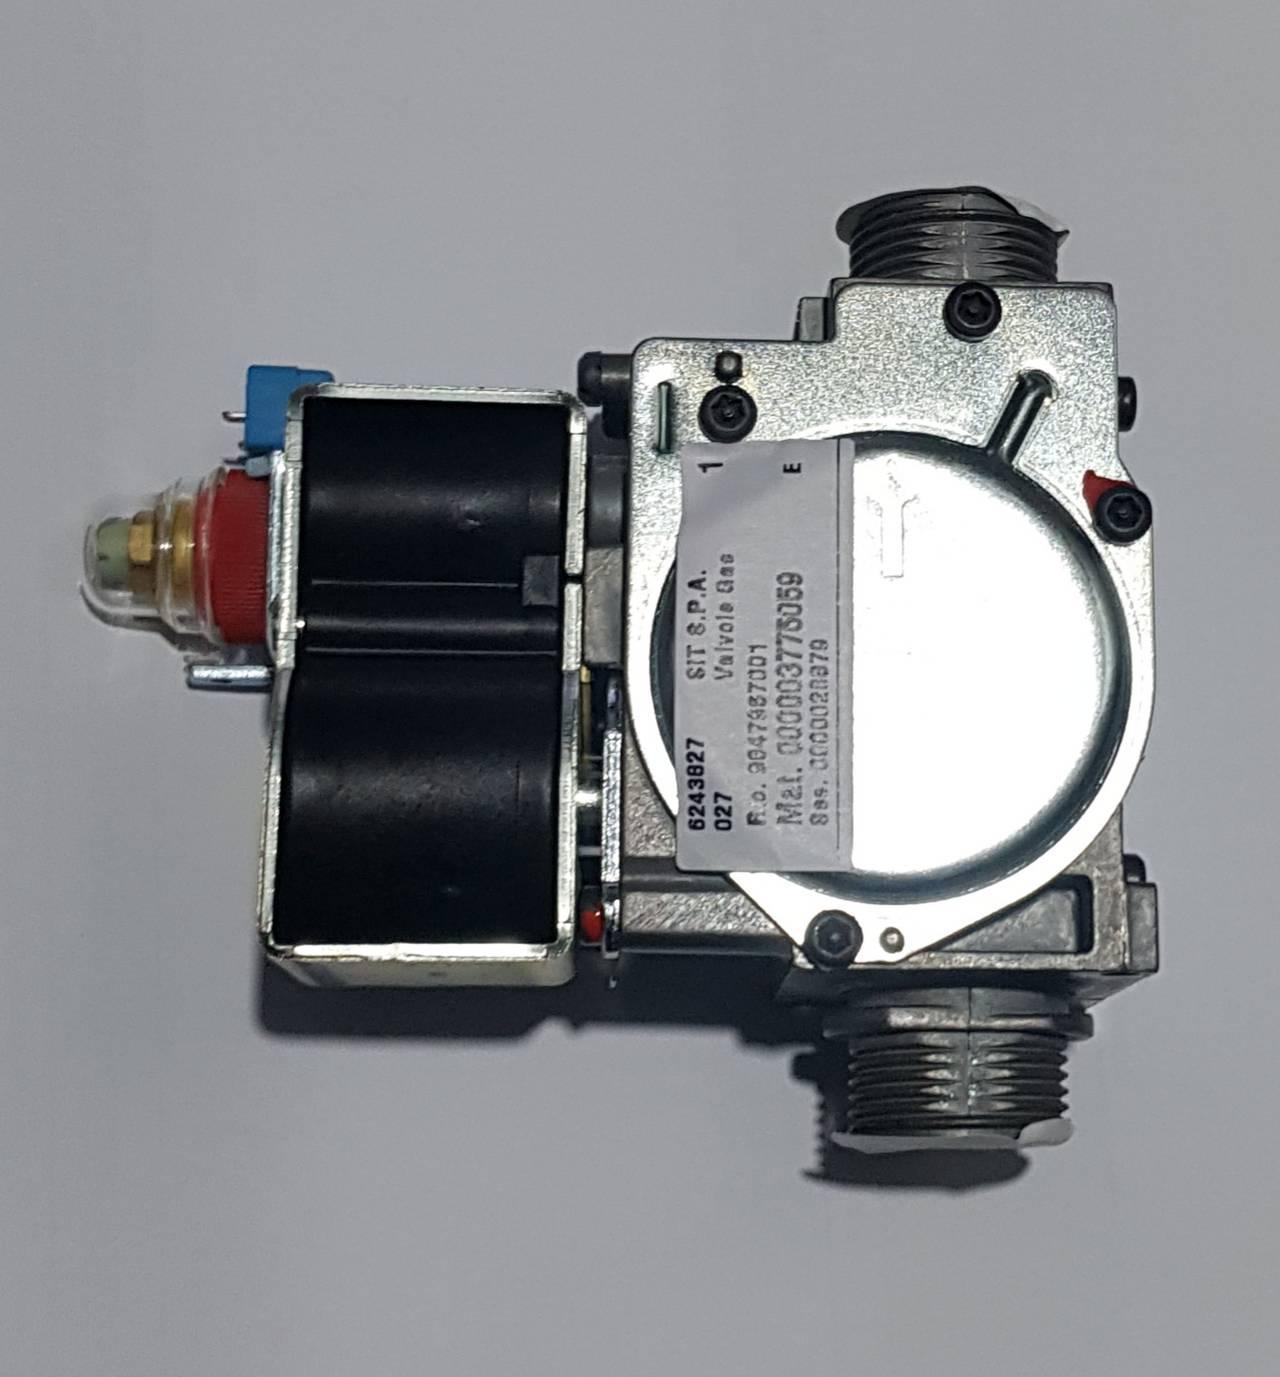 Sime valvula gas sit 845 sigma zip format 4,  - Foto 2